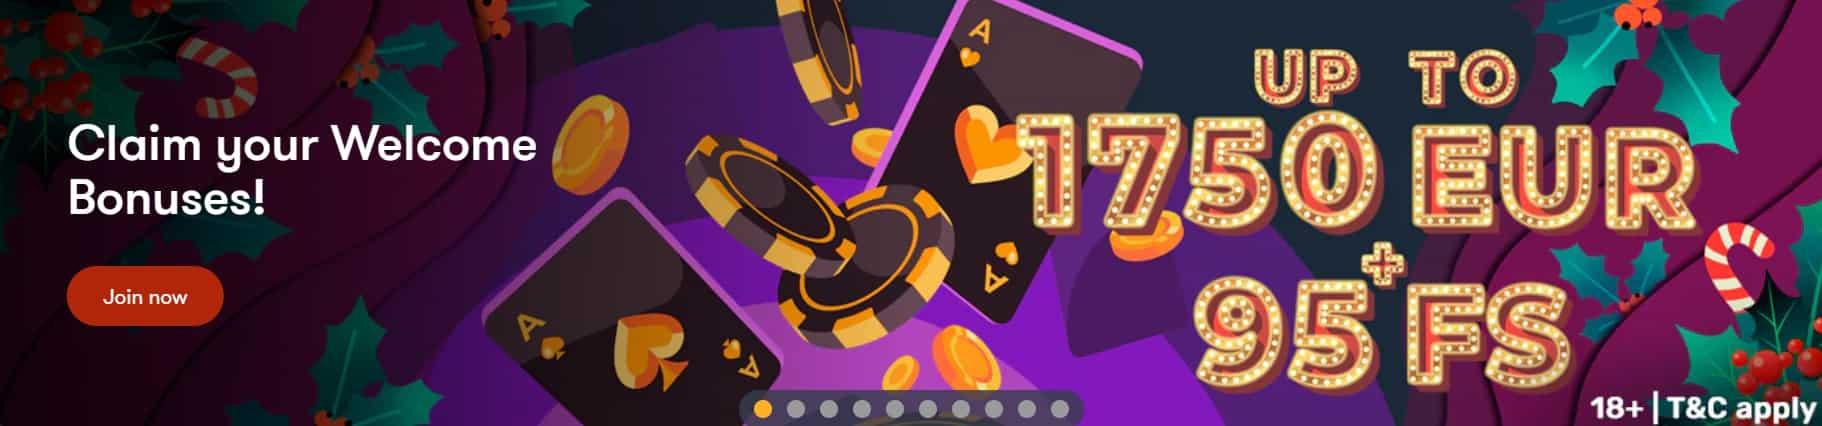 slovenske kasino online